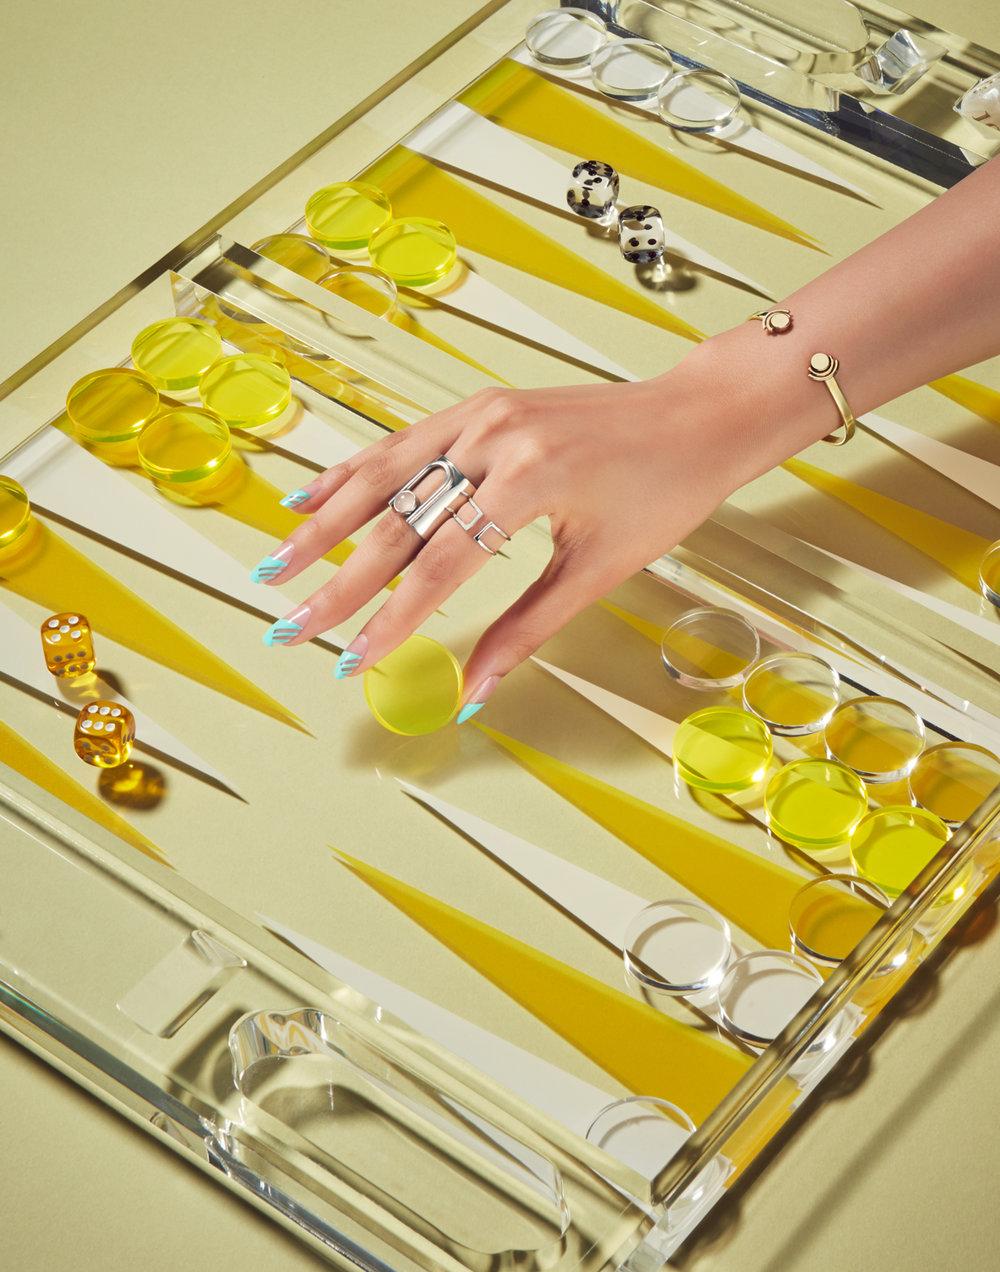 170817 Games Backgammon.jpg